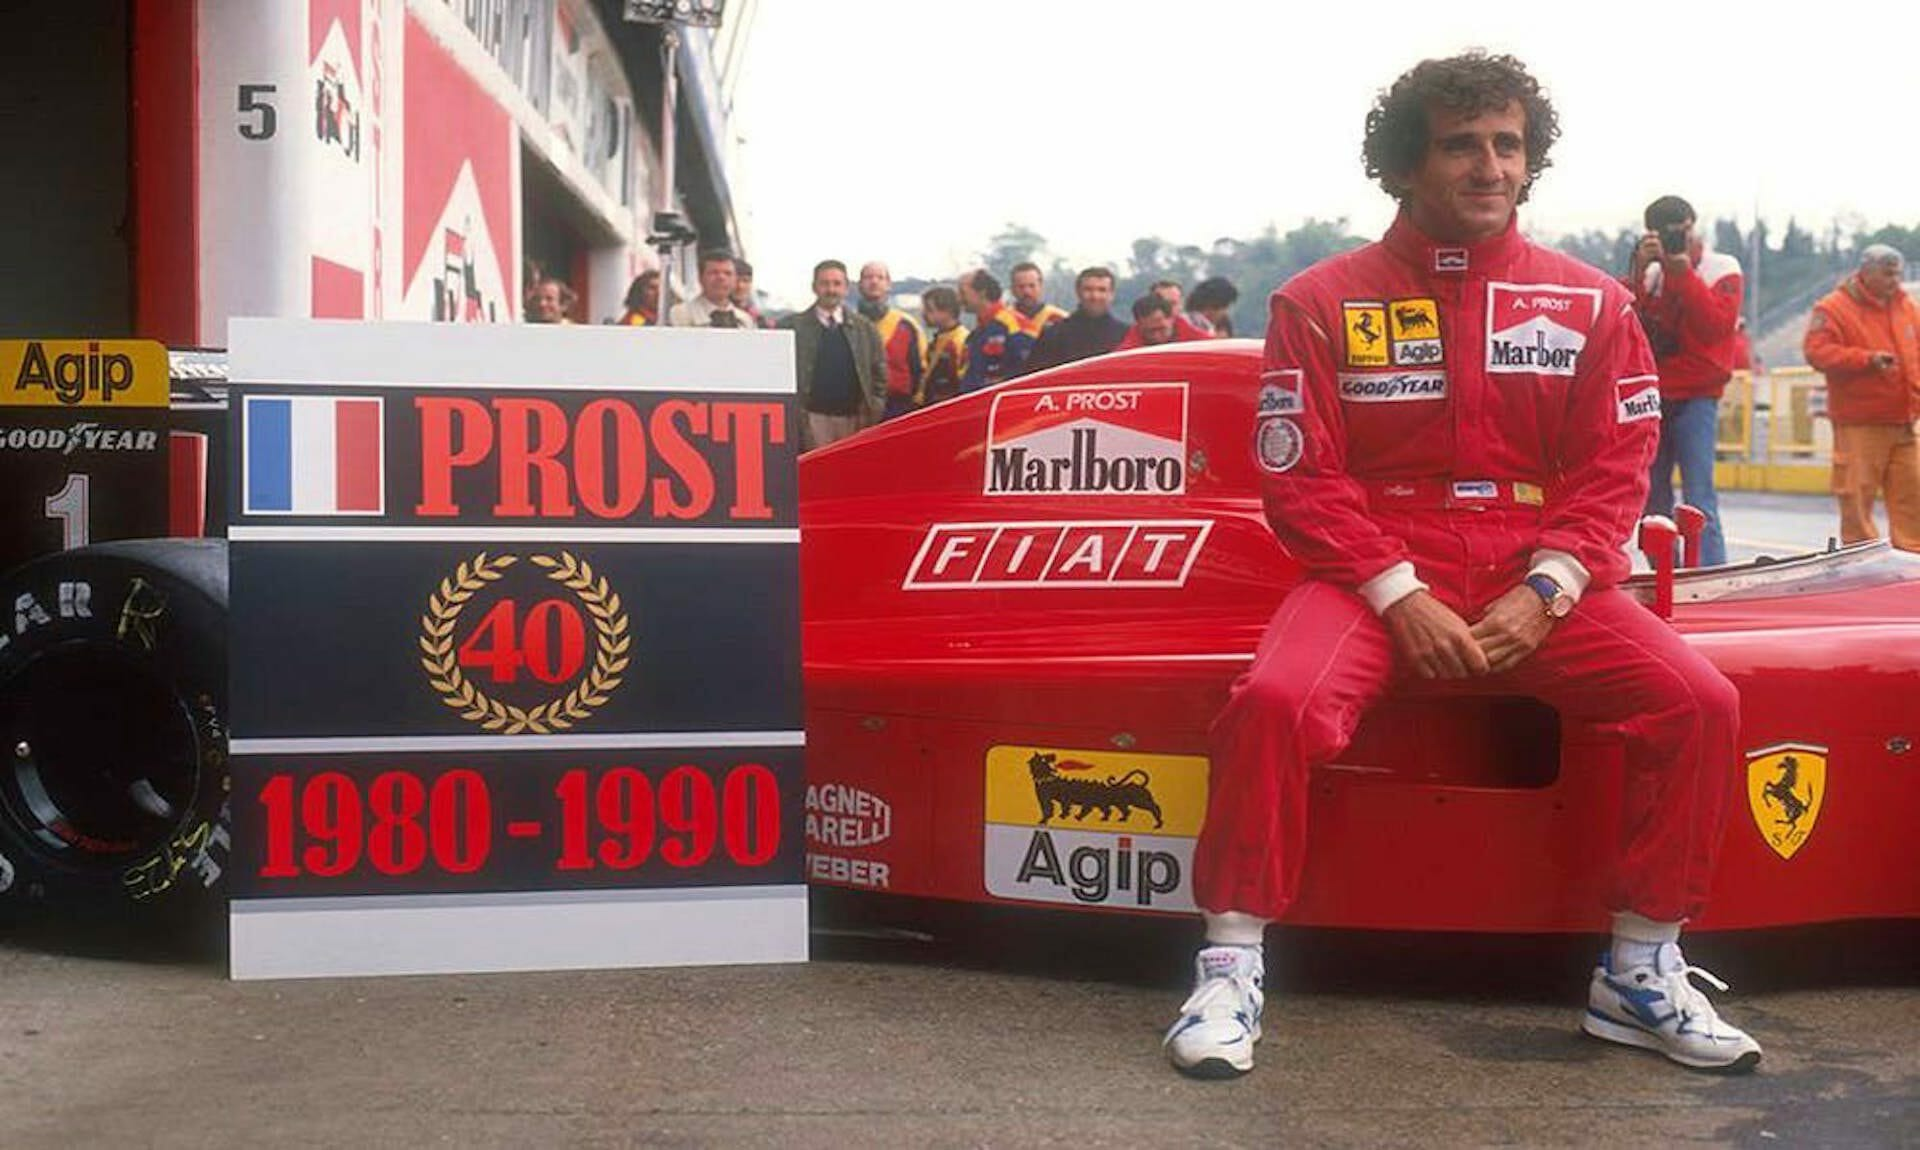 Ces pilotes français qui ont gagné avec la Scuderia Ferrari